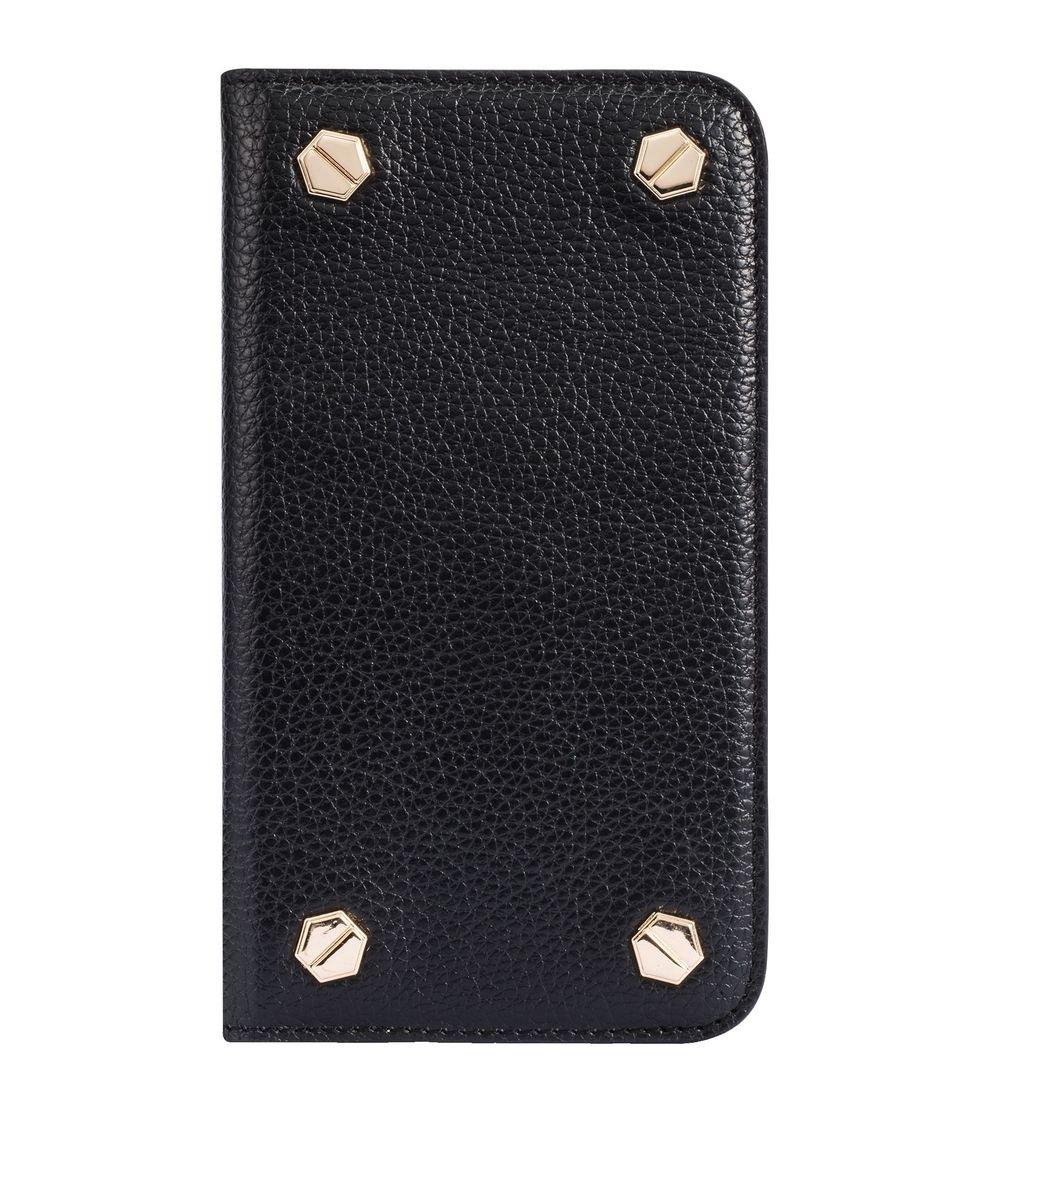 "Apple IPhone 6 Plus/6s Plus (5.5"") Hex-shine 系列義大利高級牛皮時尚手機套 (黑色荔枝條紋)"